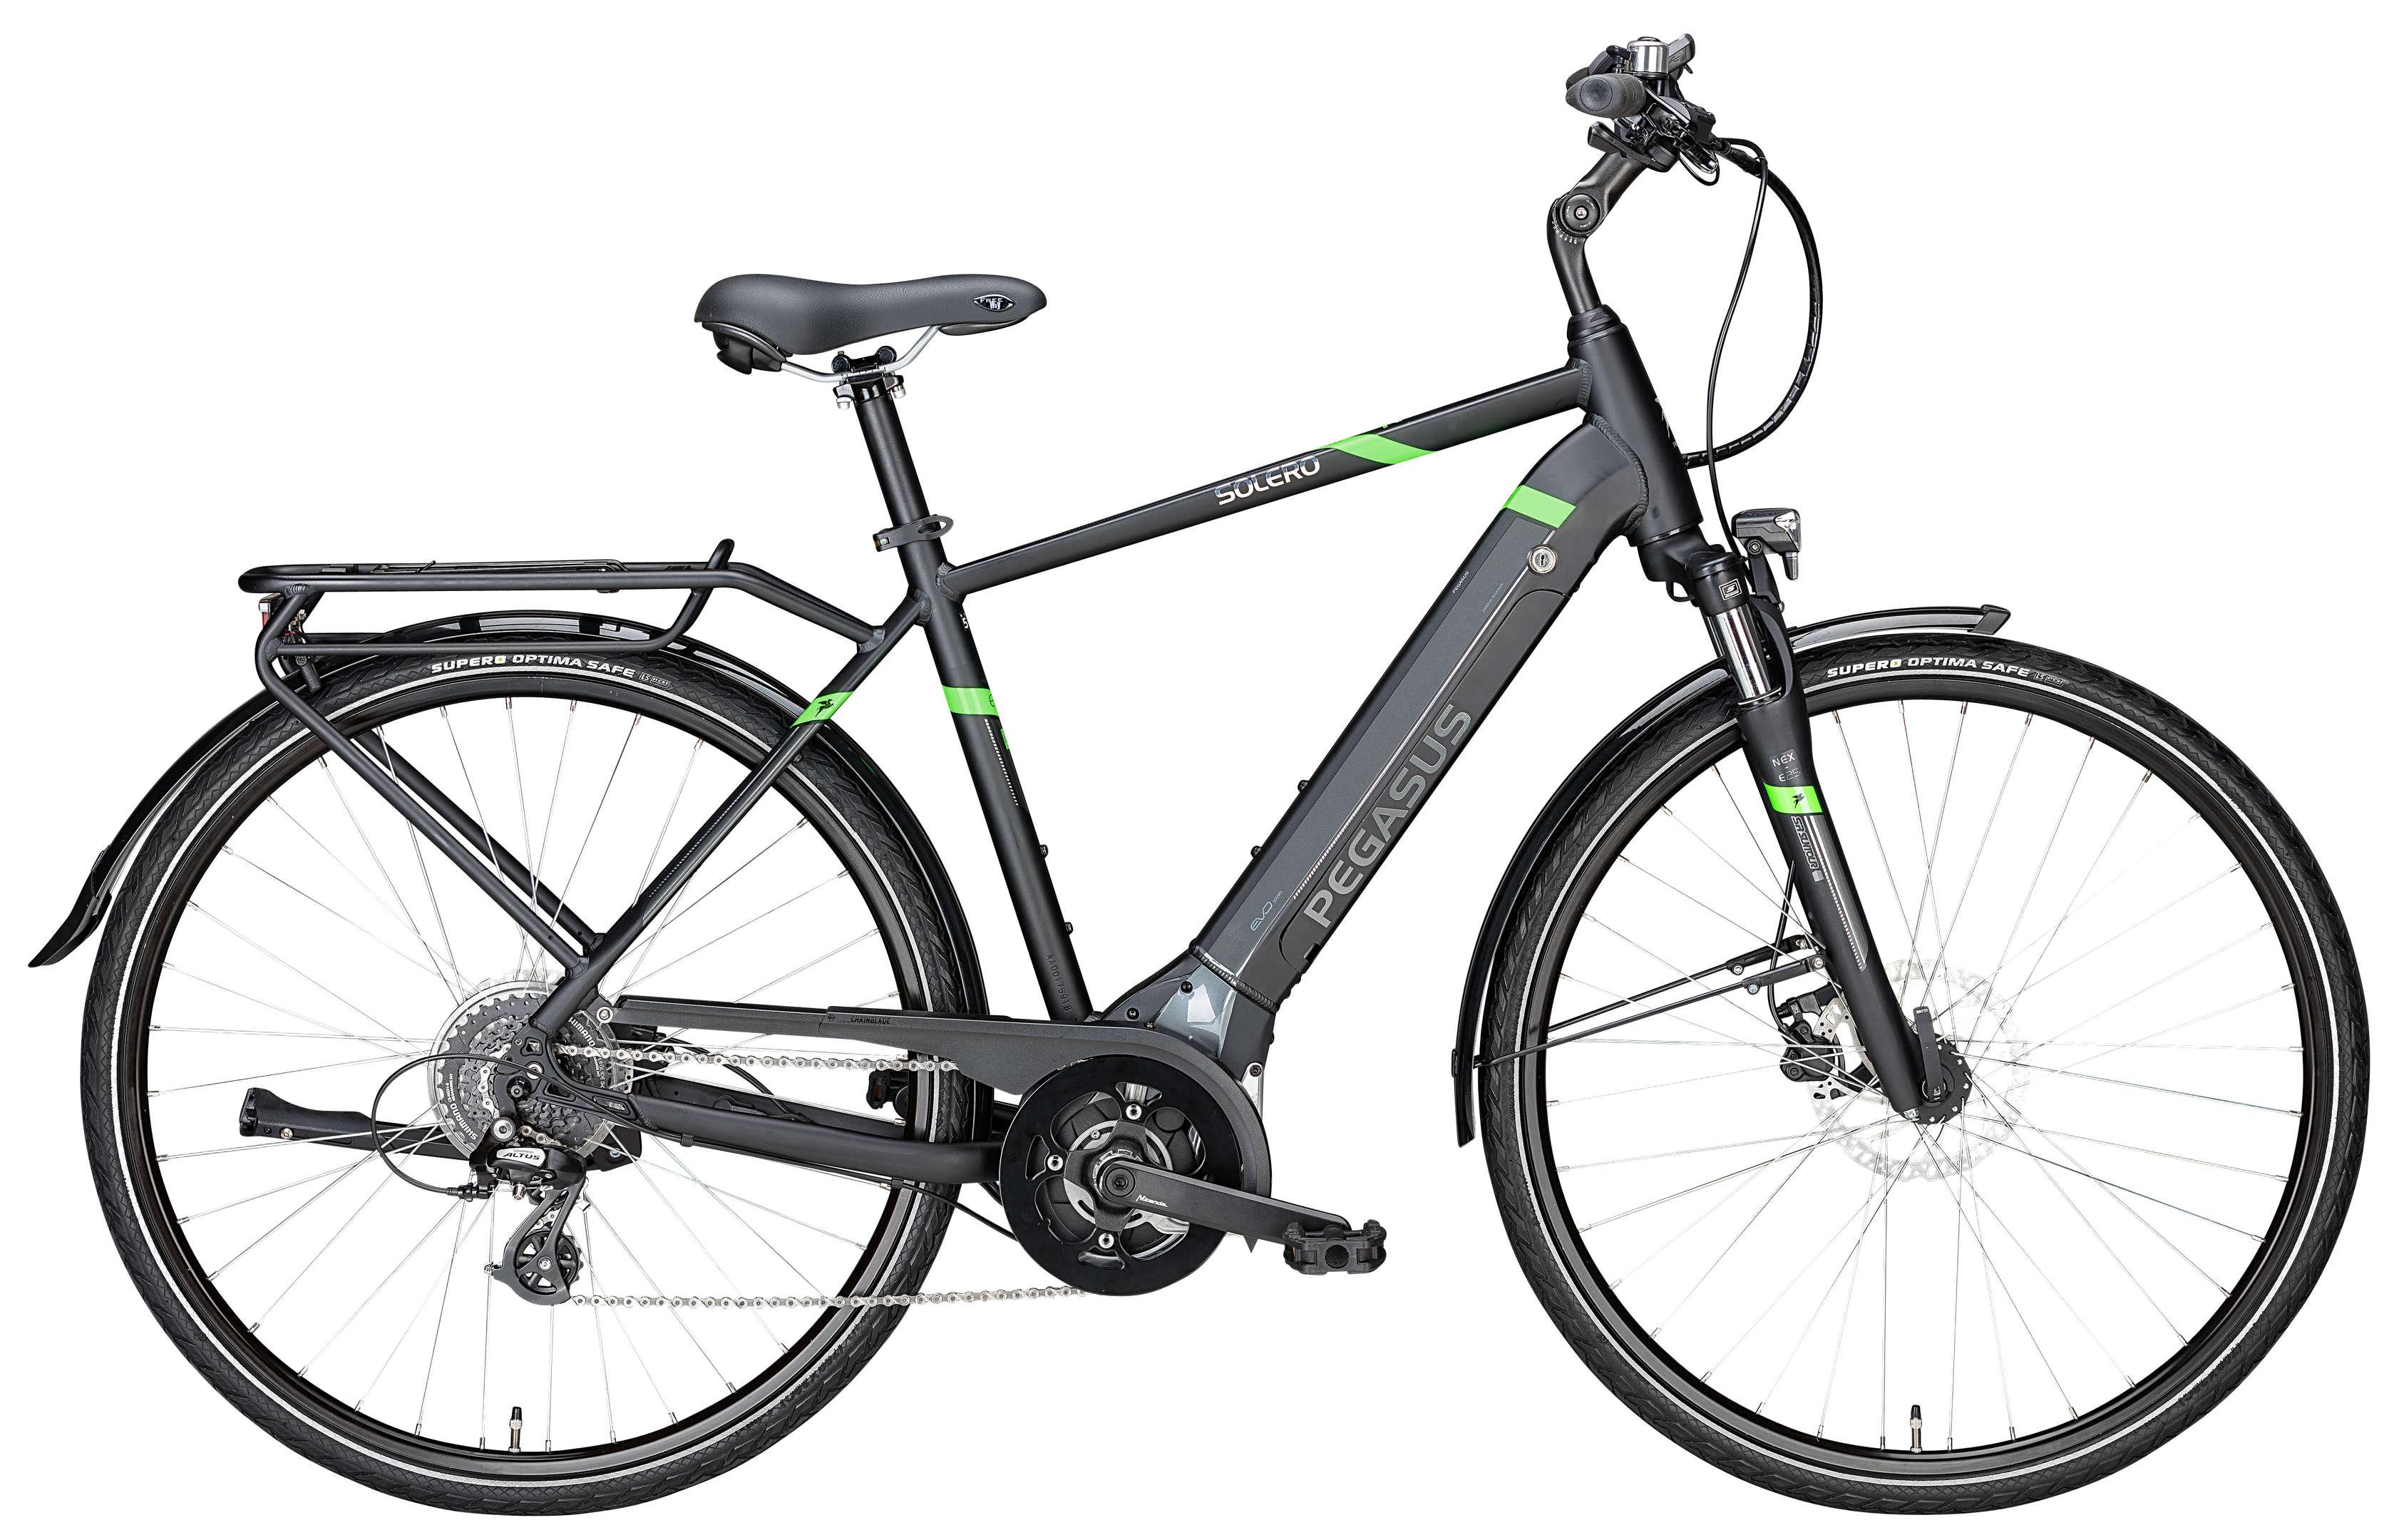 pegasus e bike solero evo 8 eurorad bikeleasingeurorad. Black Bedroom Furniture Sets. Home Design Ideas